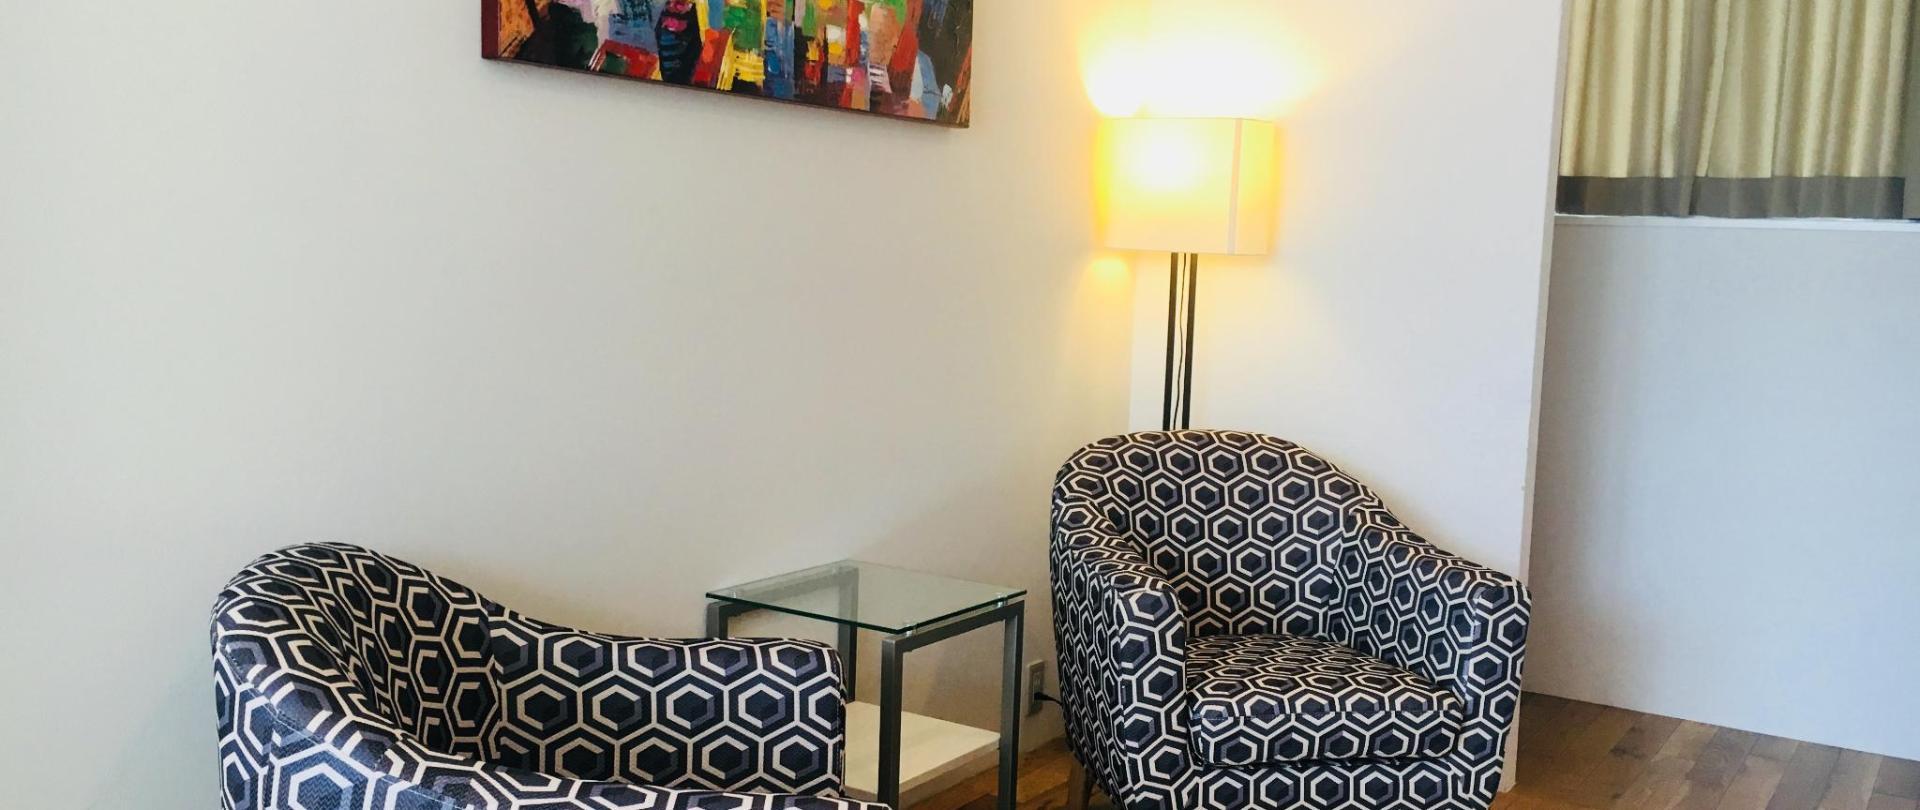 7F 椅子.jpg